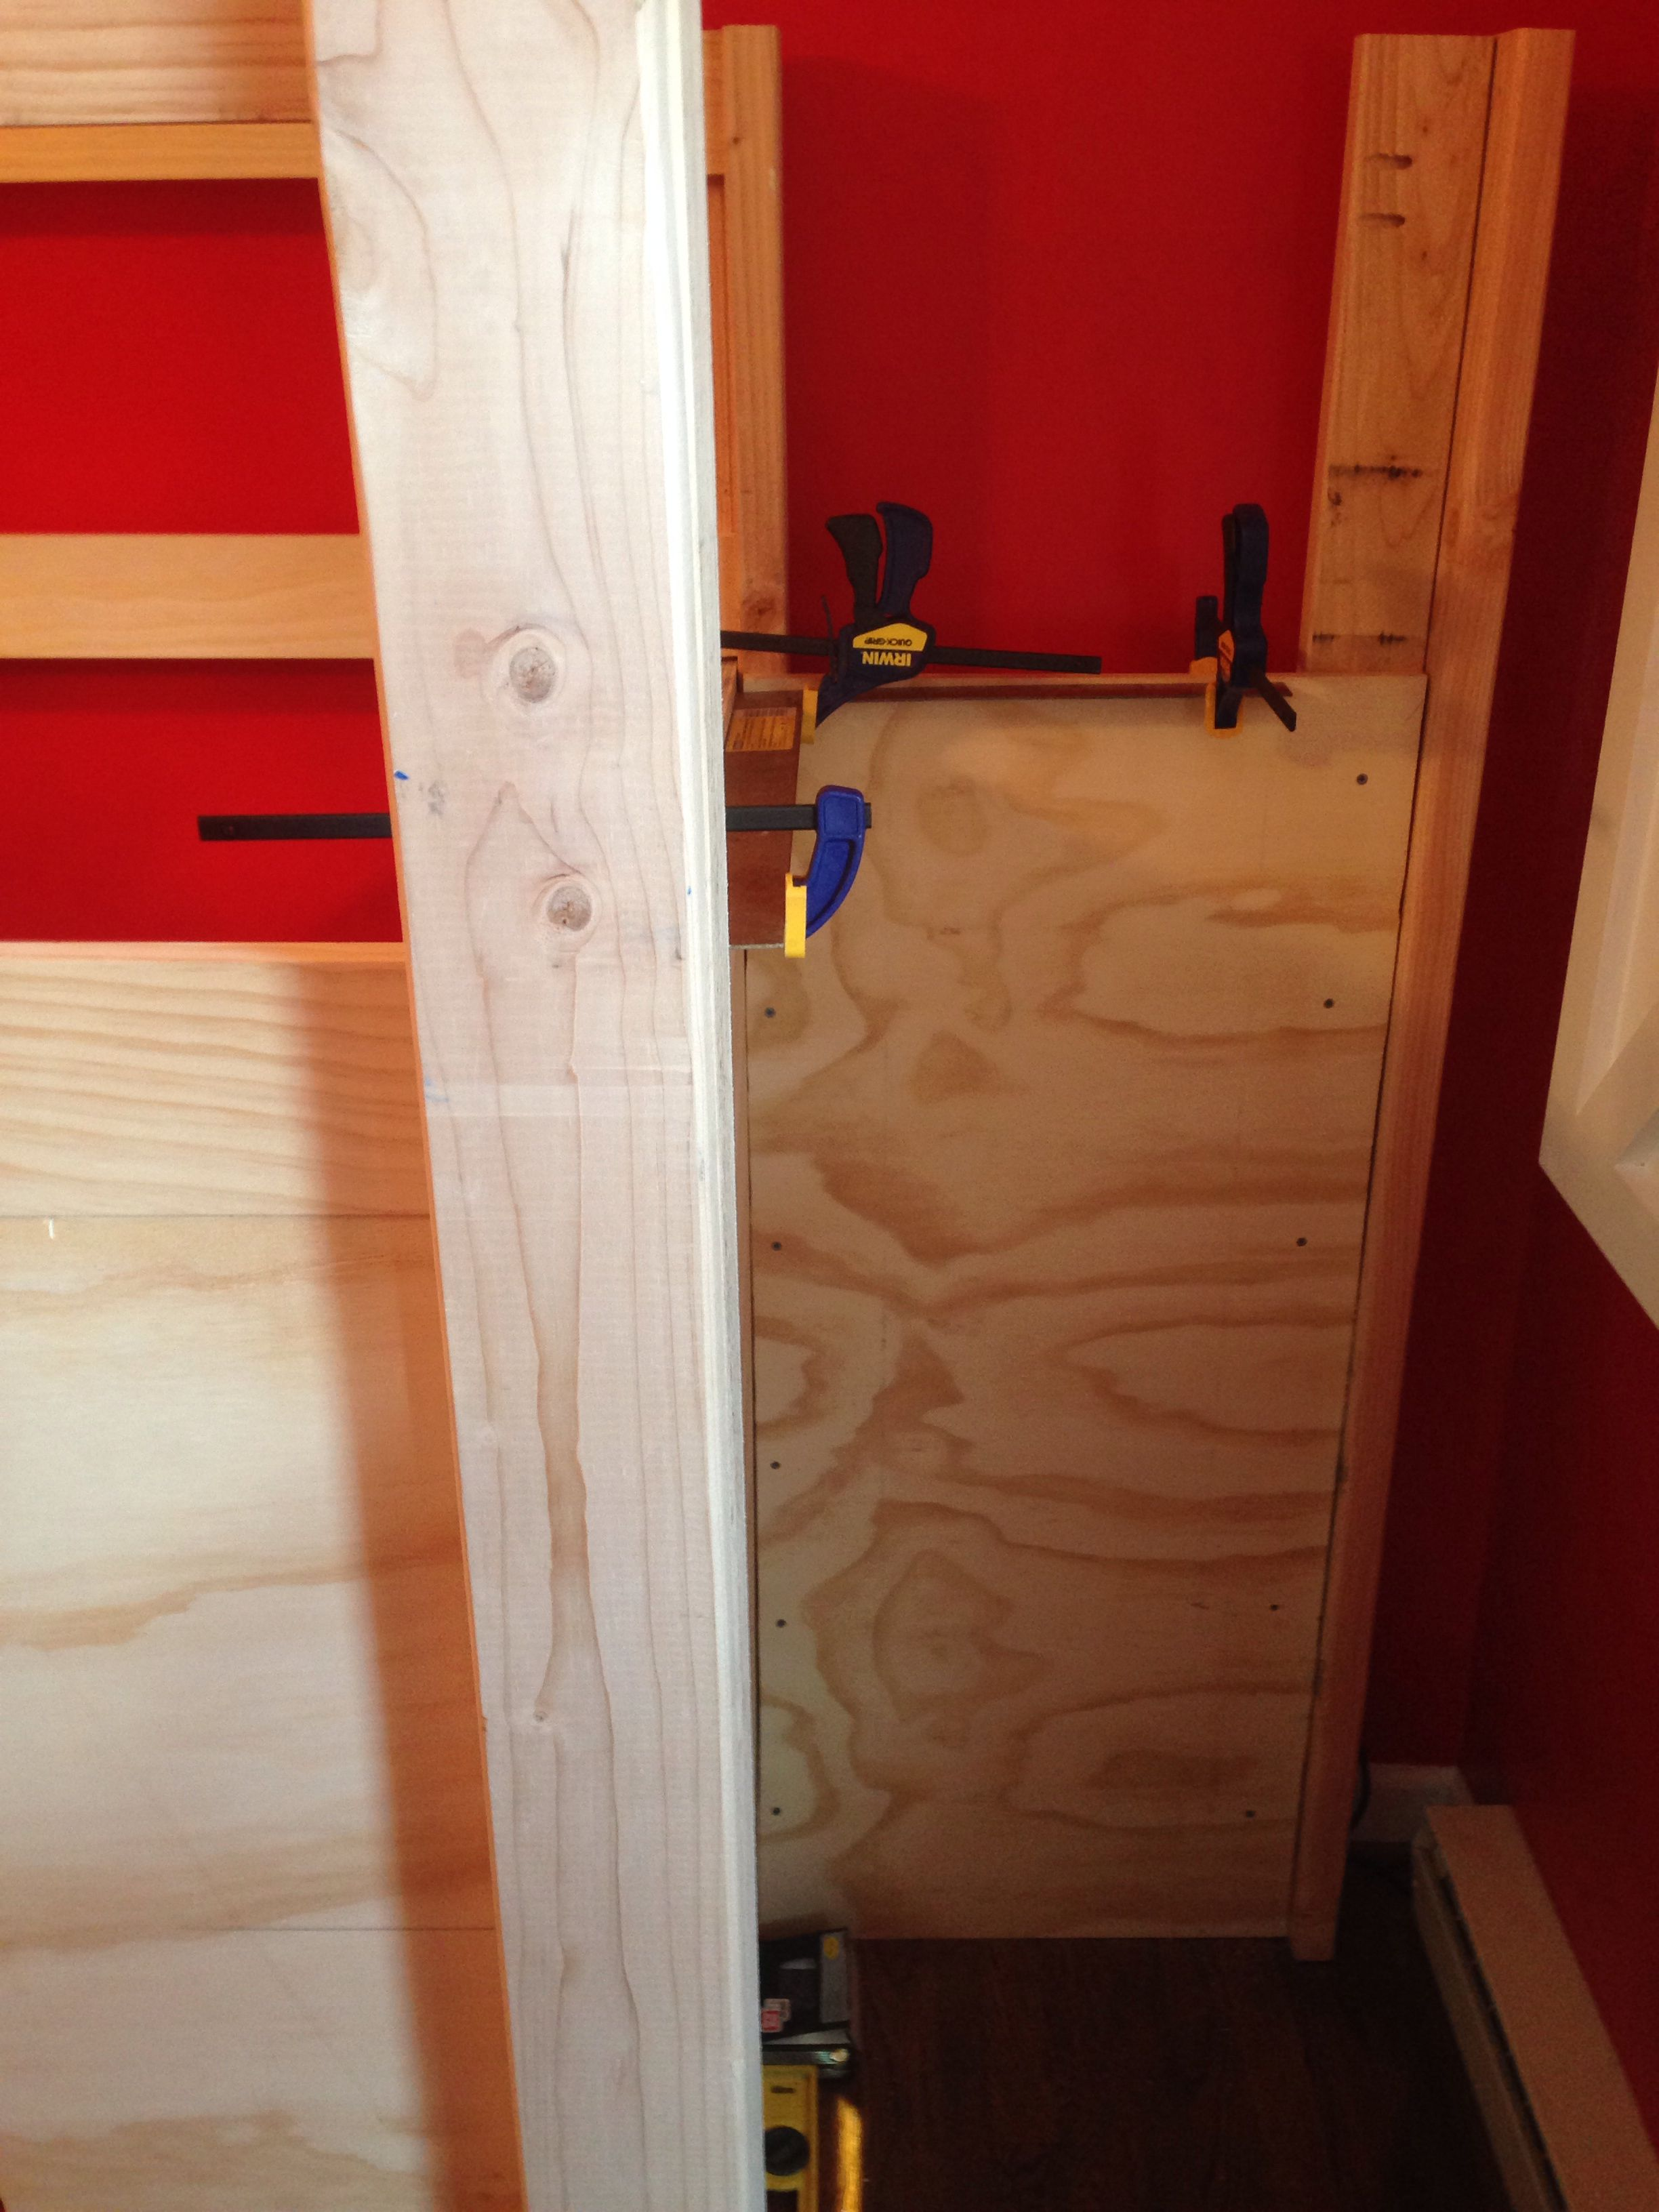 Firetruck Bed Frame Fire Truck Bed Bed Bed Frame Fire Trucks